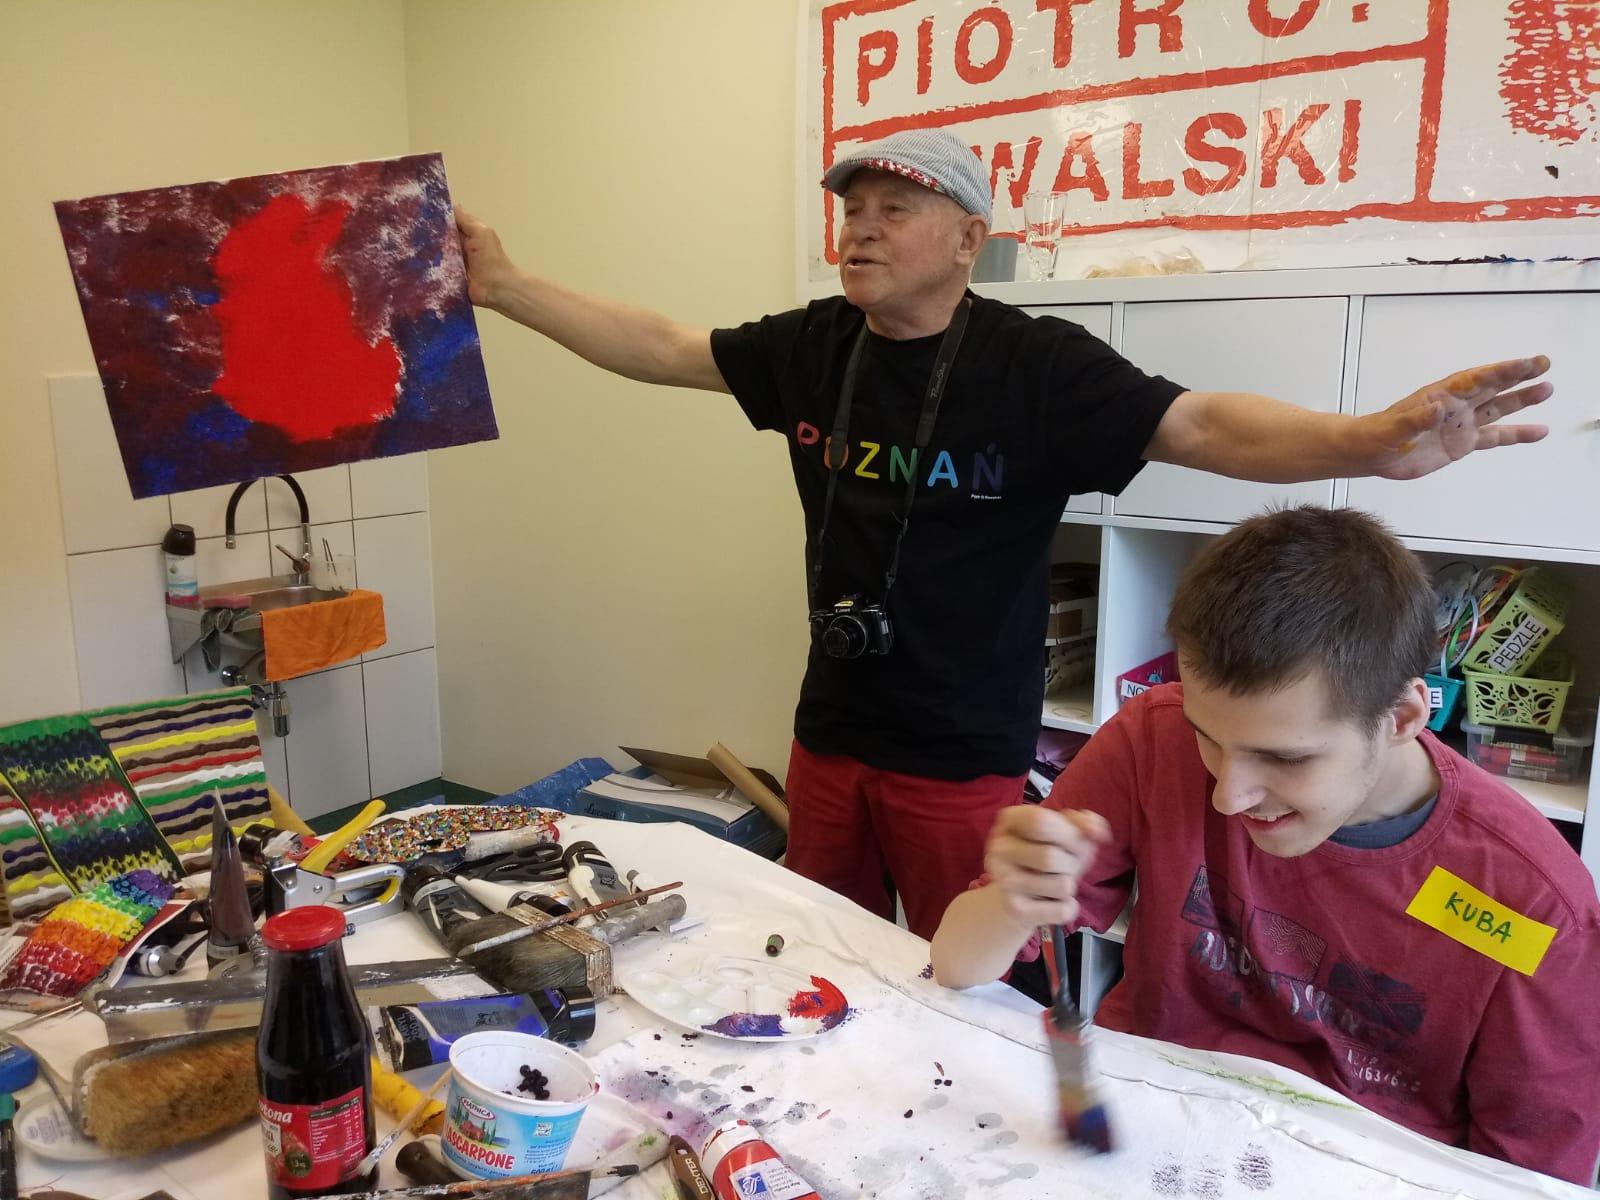 Galeria Dom. Piotr C. Kowalski i Jakub Kompowski